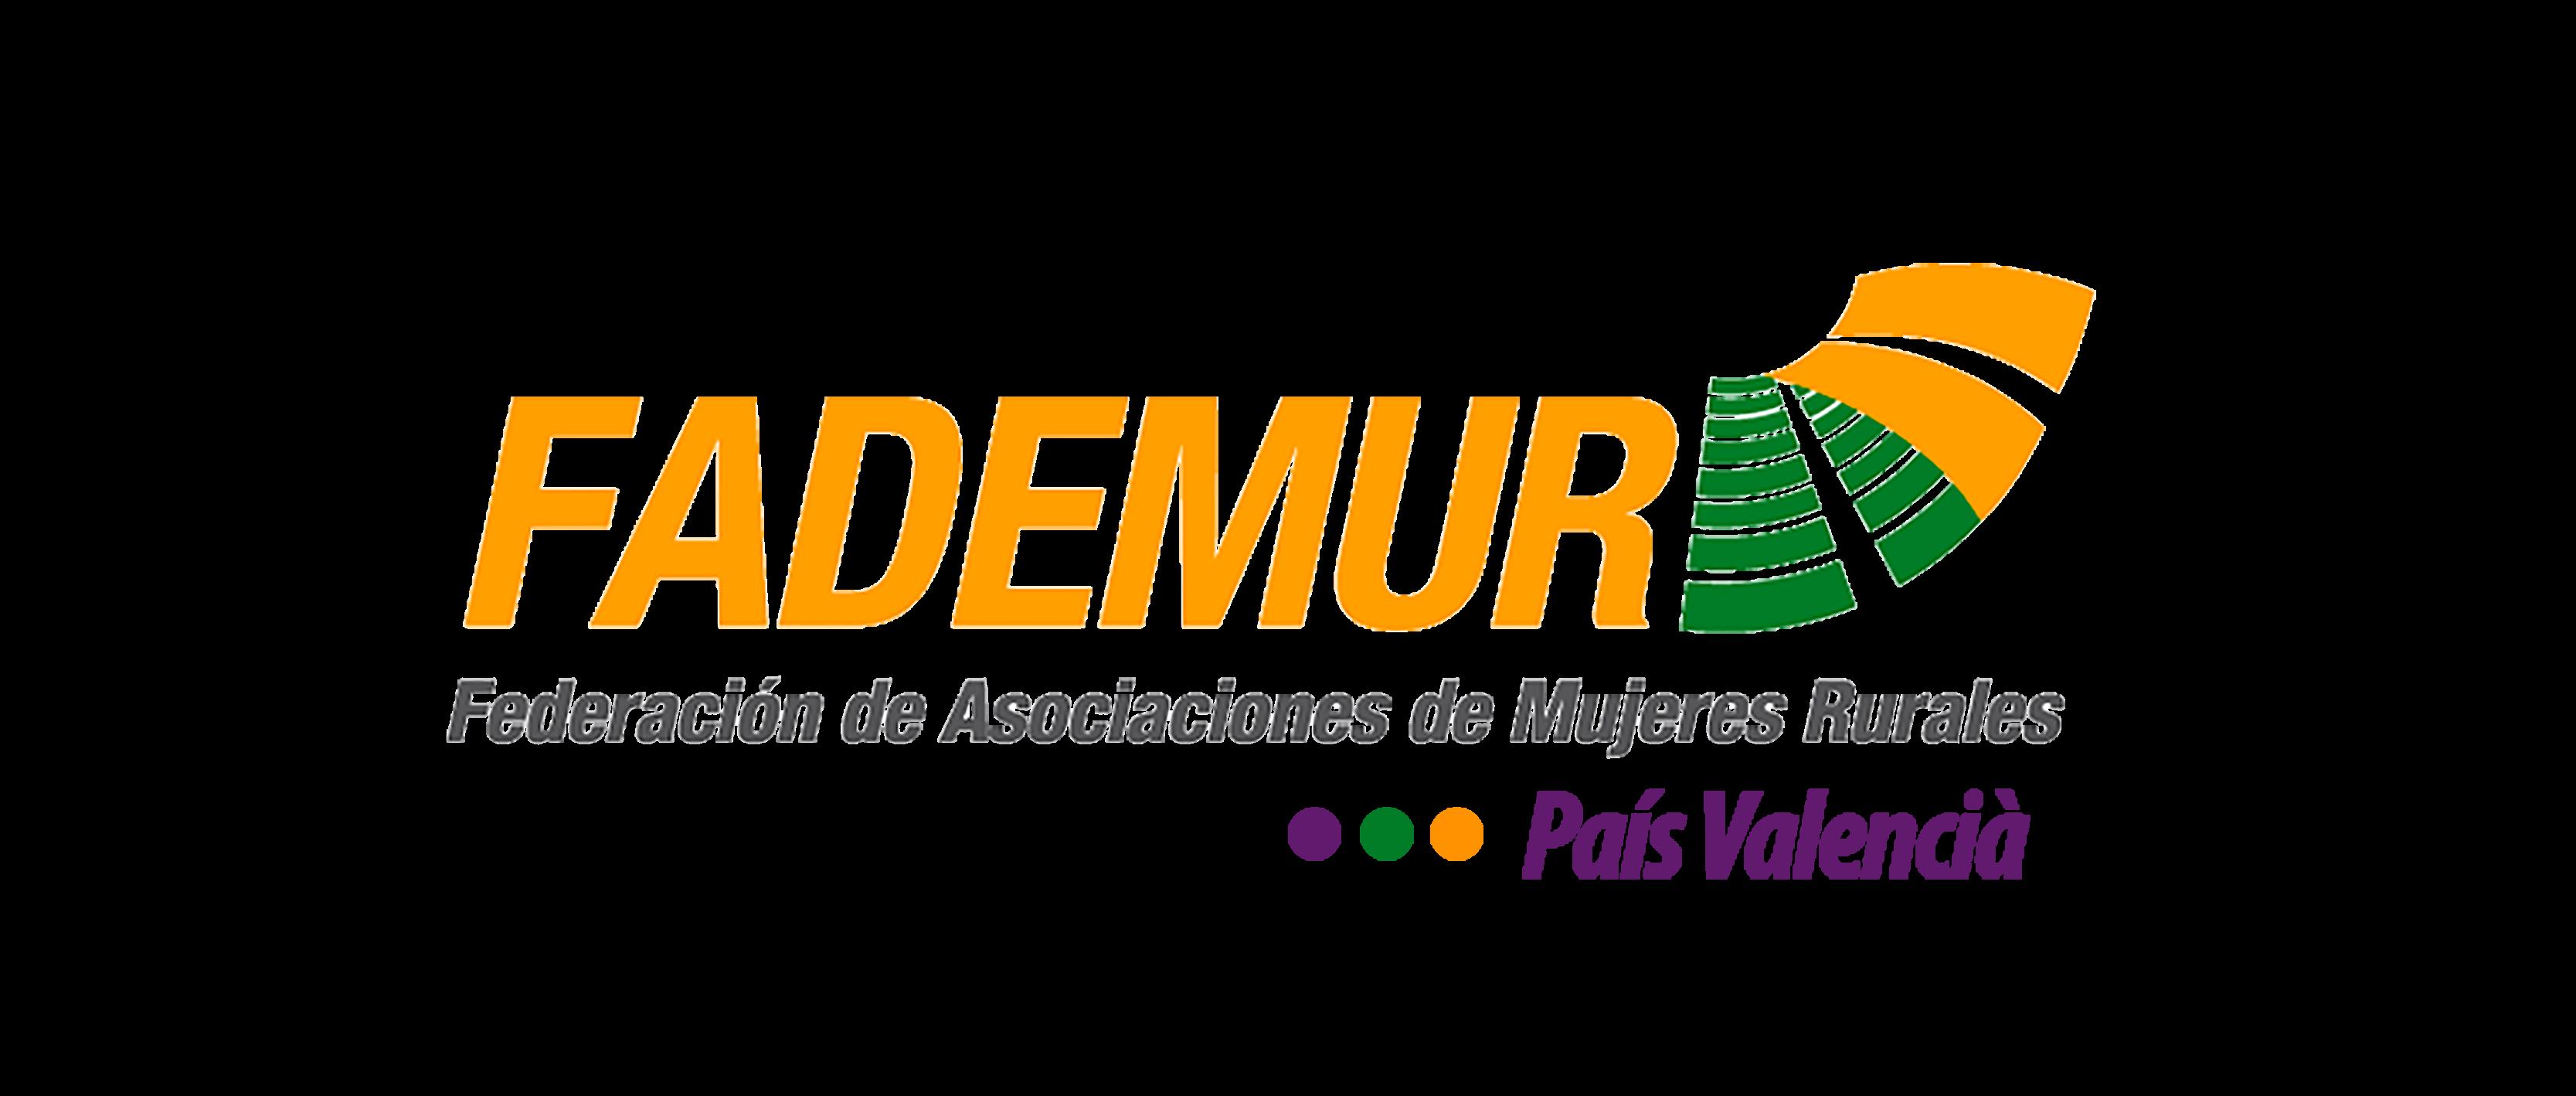 FademurPV